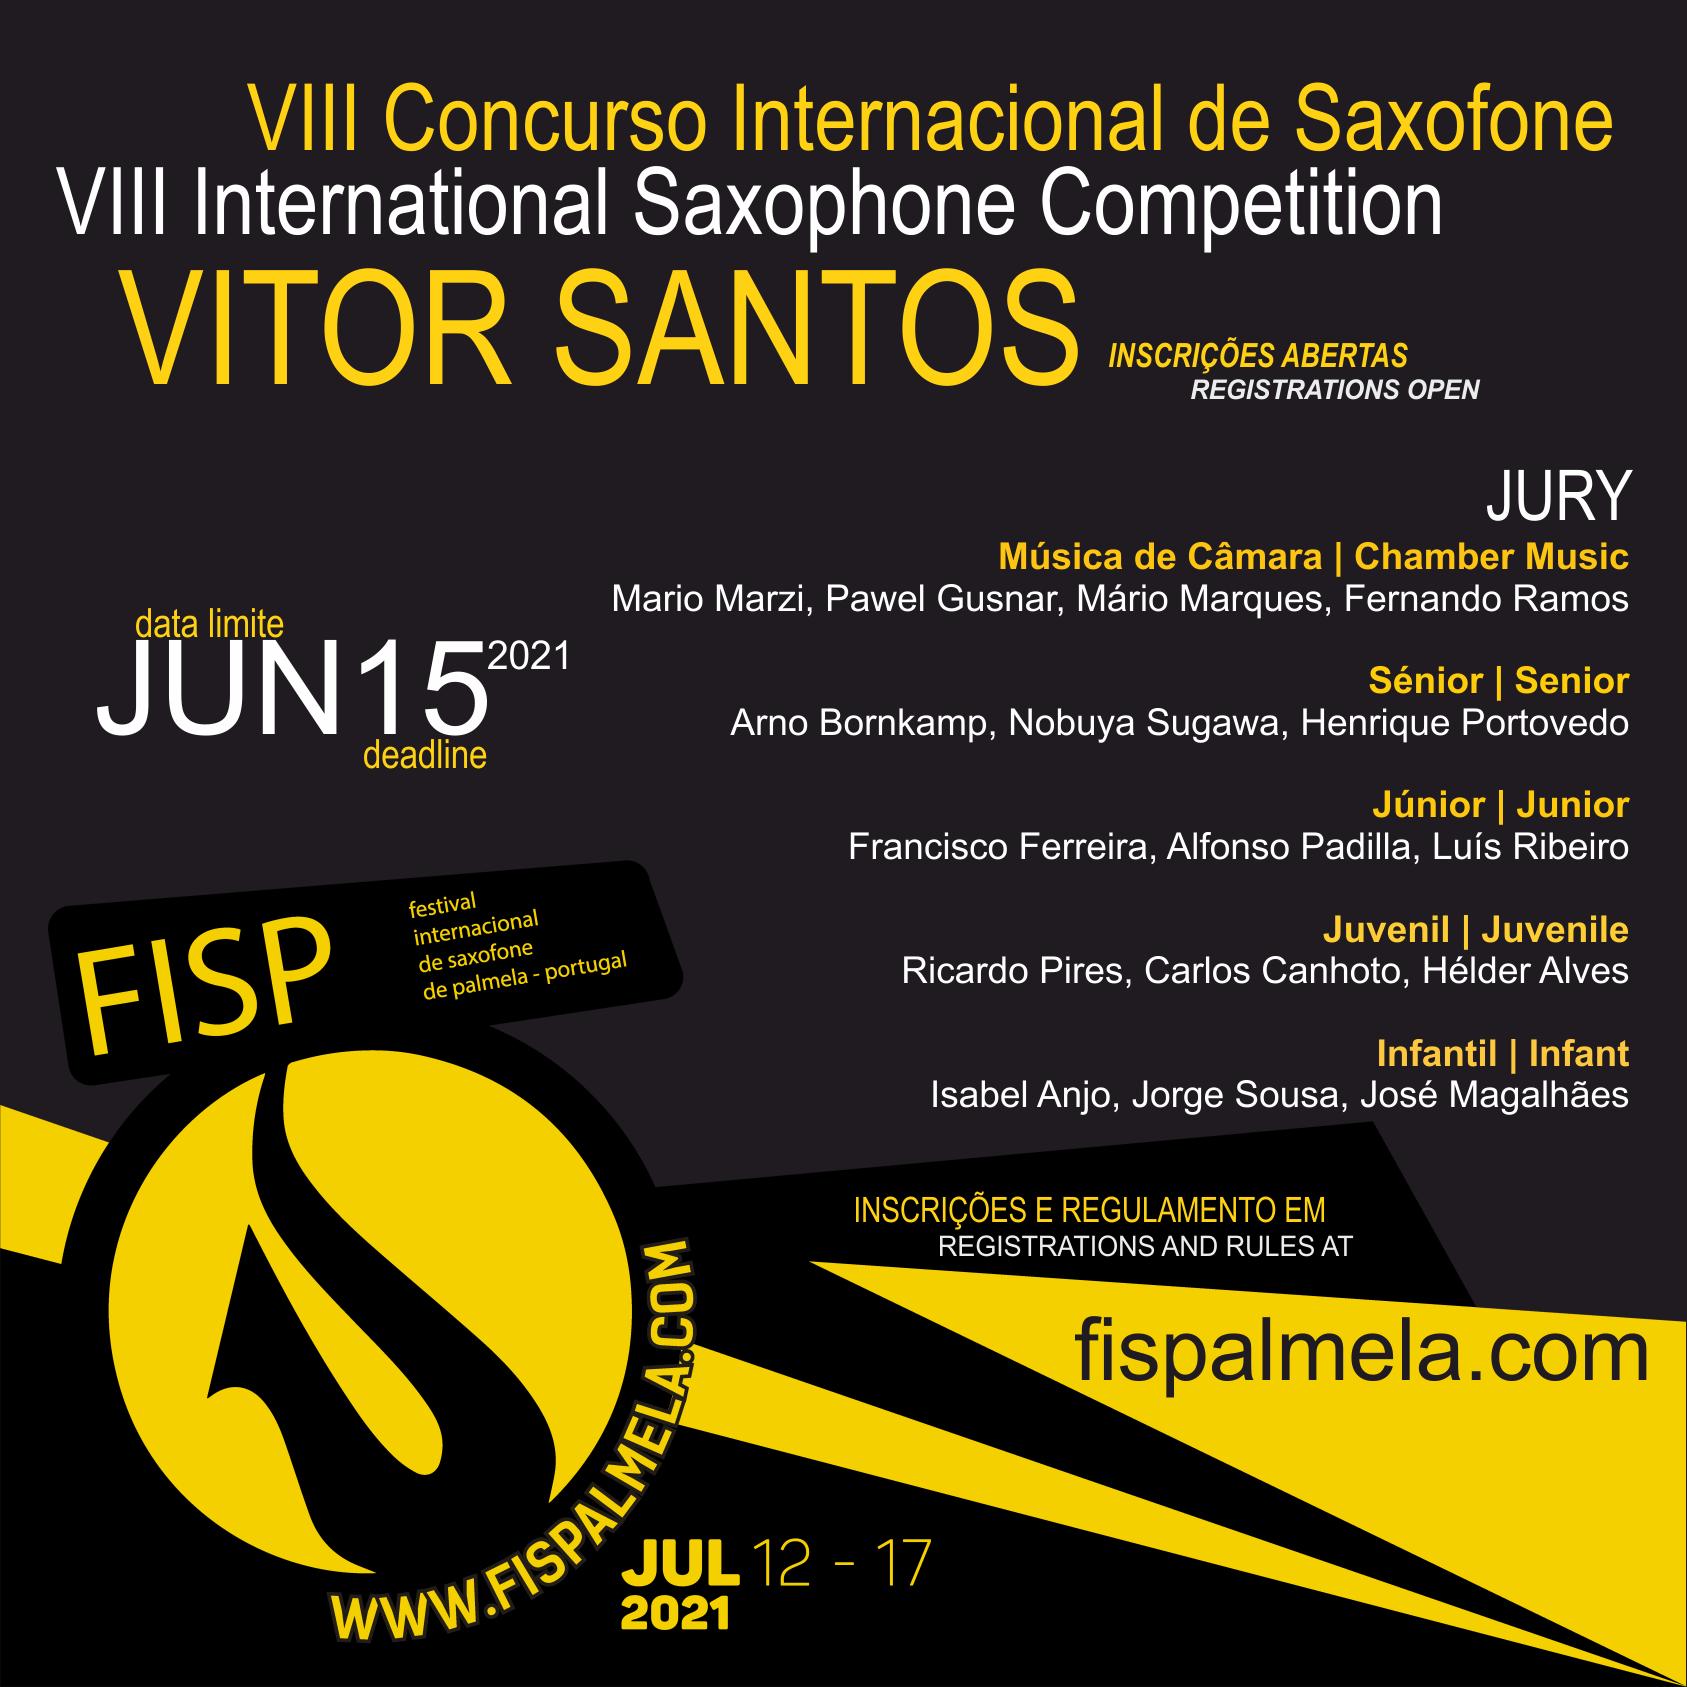 Vitor Santos Competition